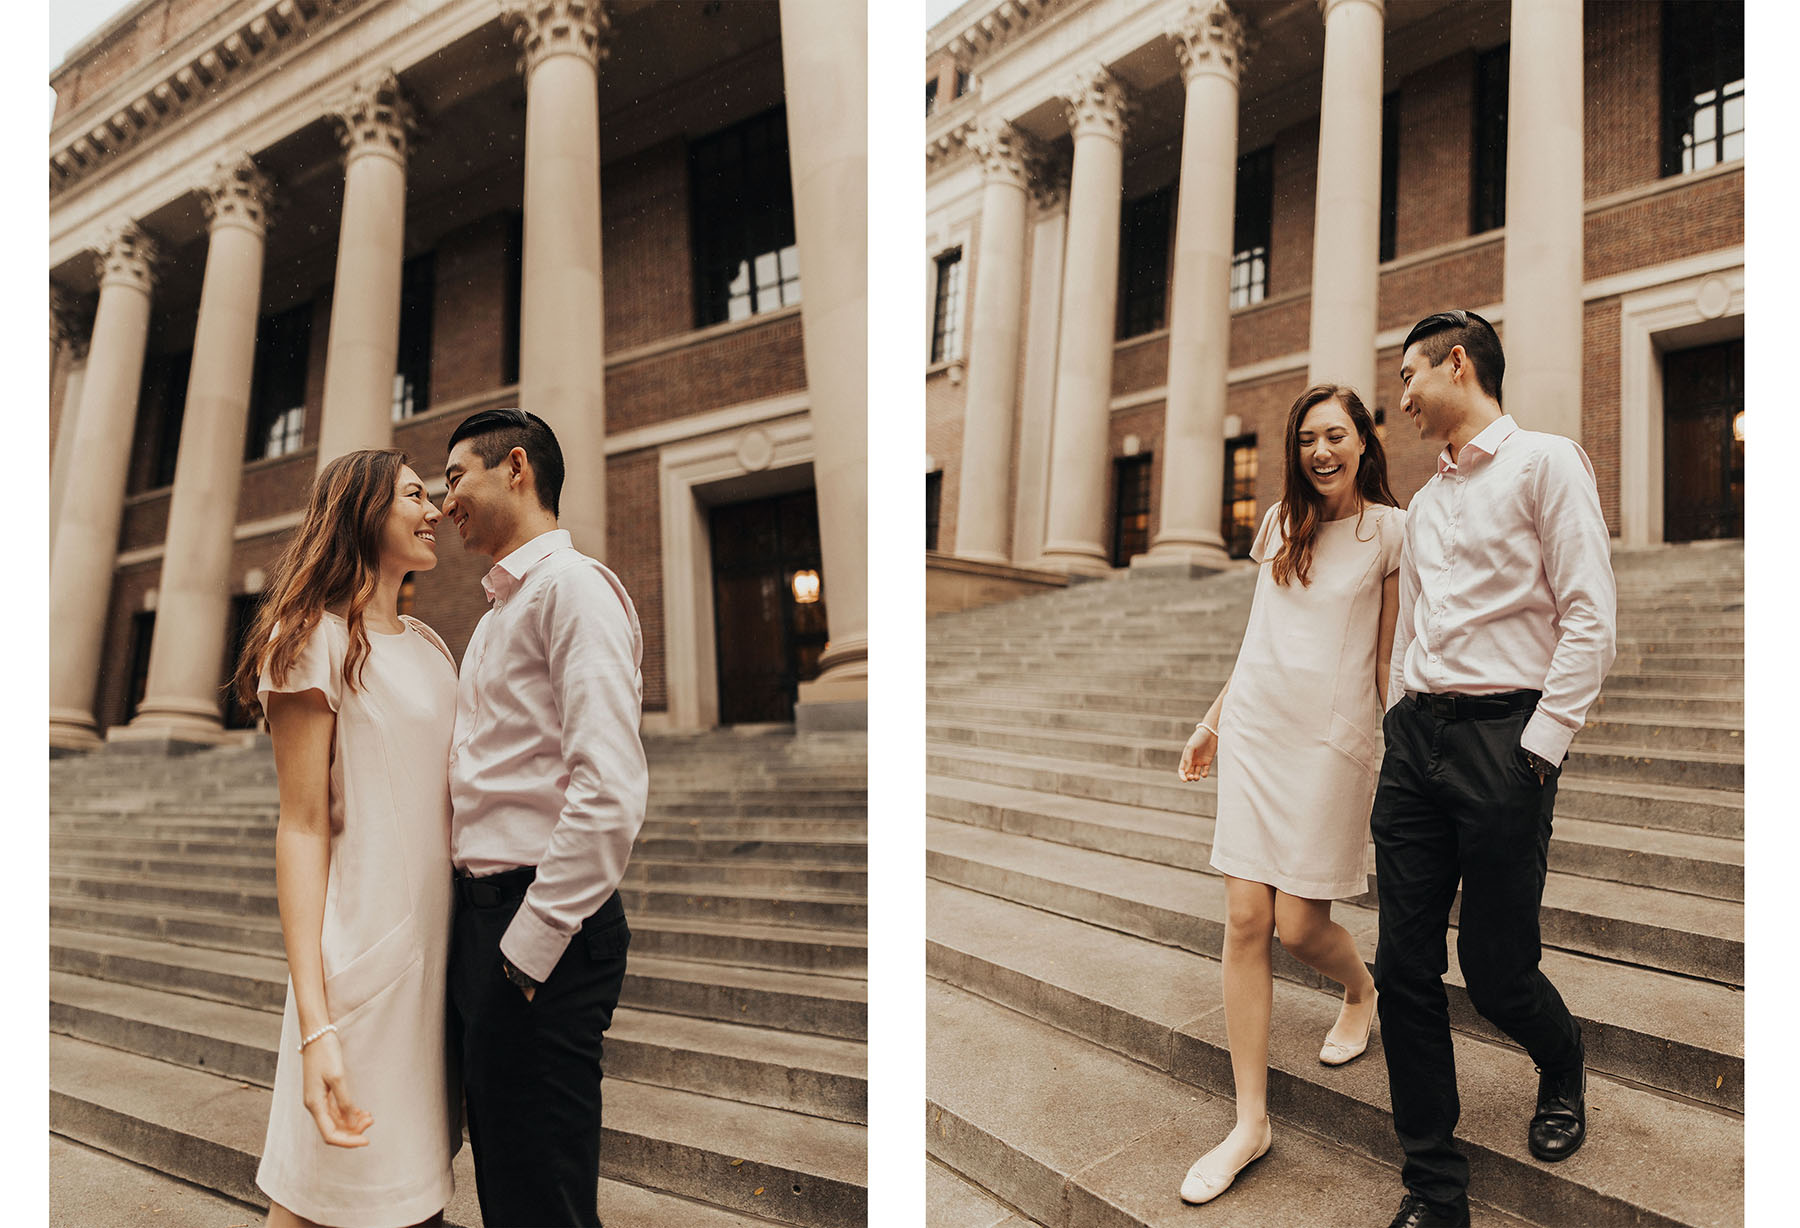 Ghania-iratni-photographe-mariage-couple-bordeaux-0